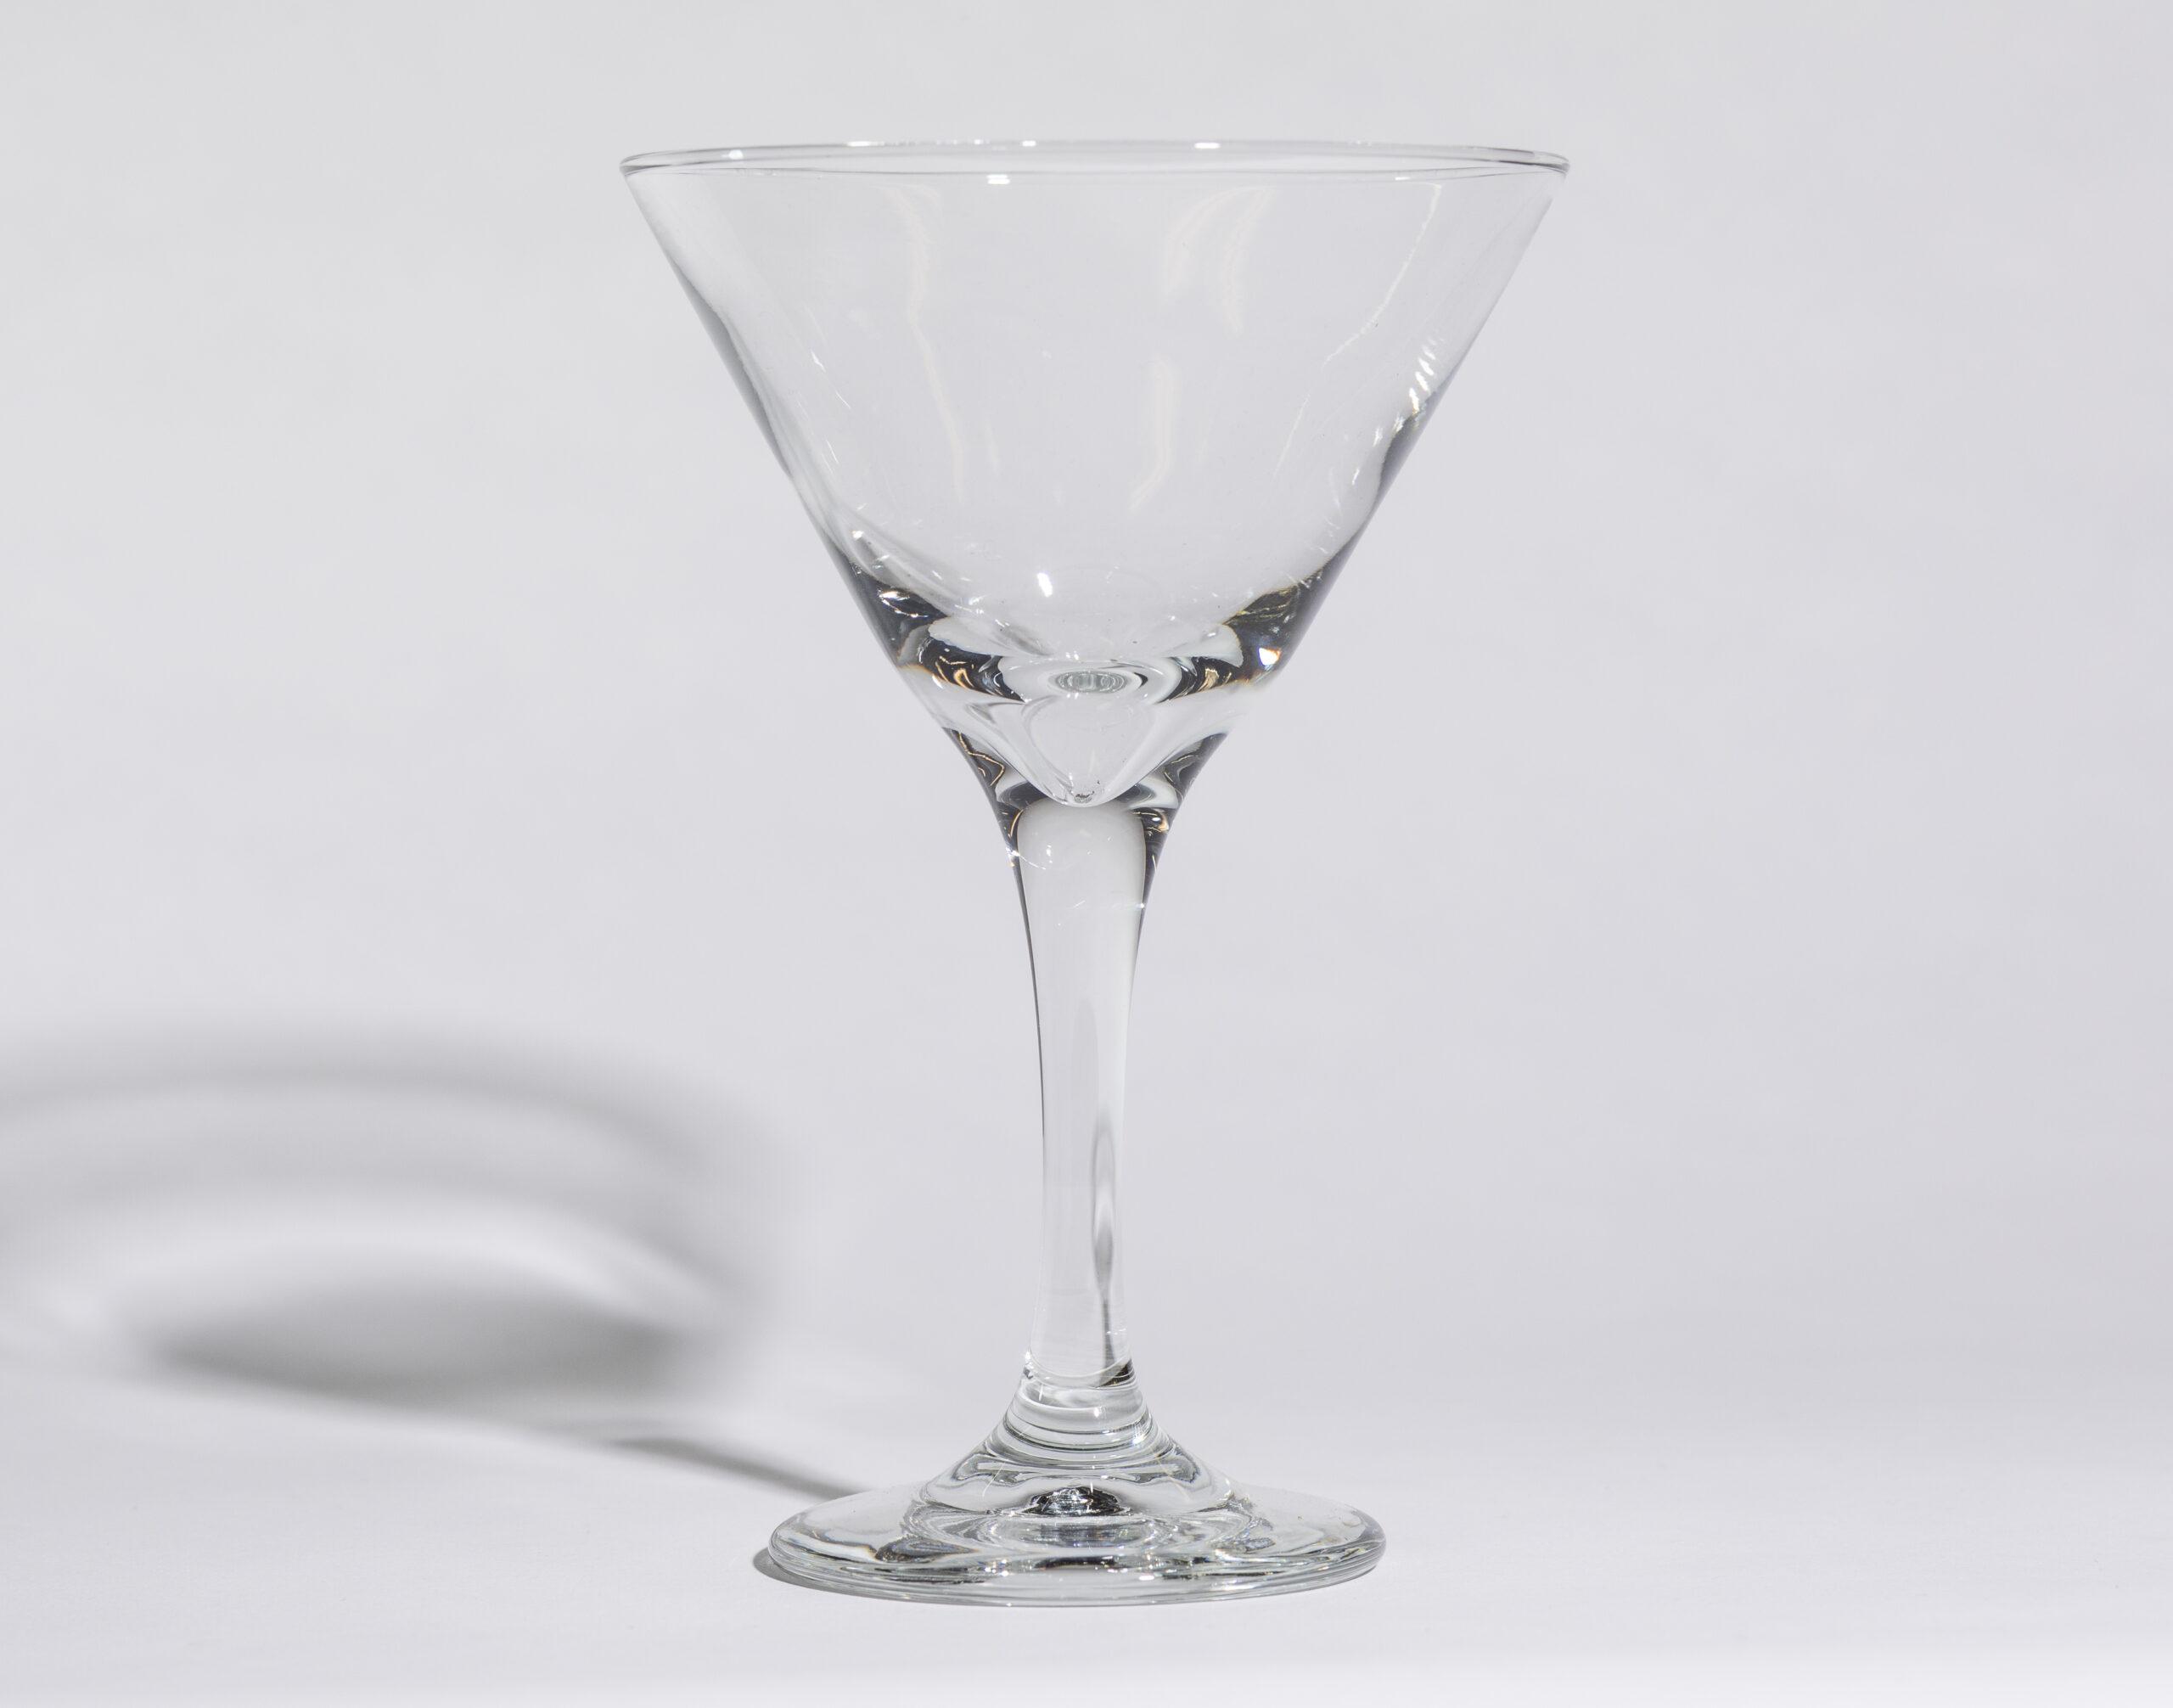 Martini glasses (10oz, stemmed)